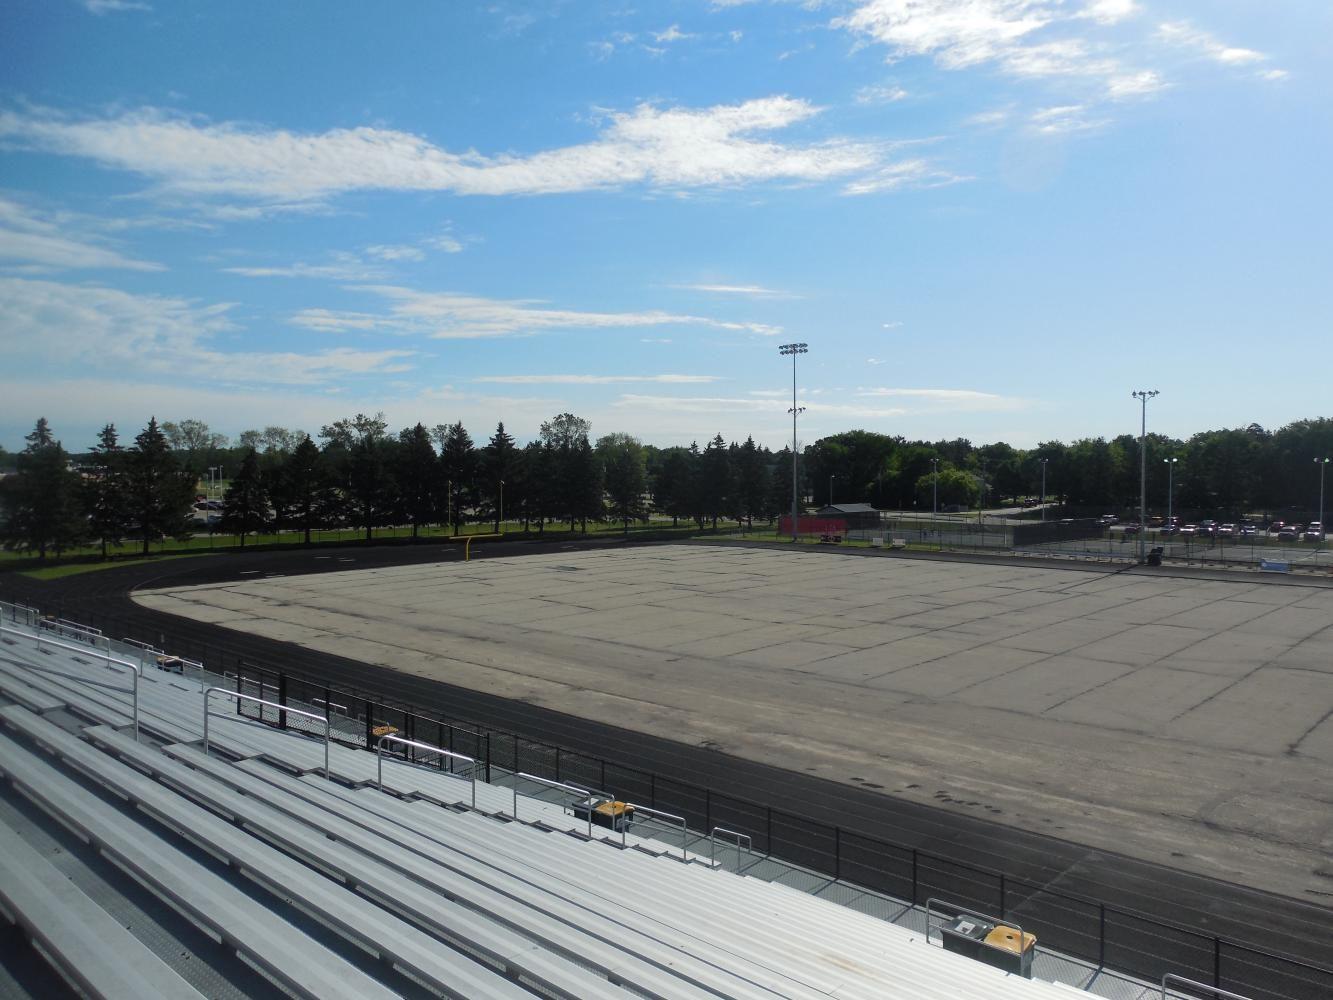 Arrowhead Replaces Field Turf on the Football Stadium